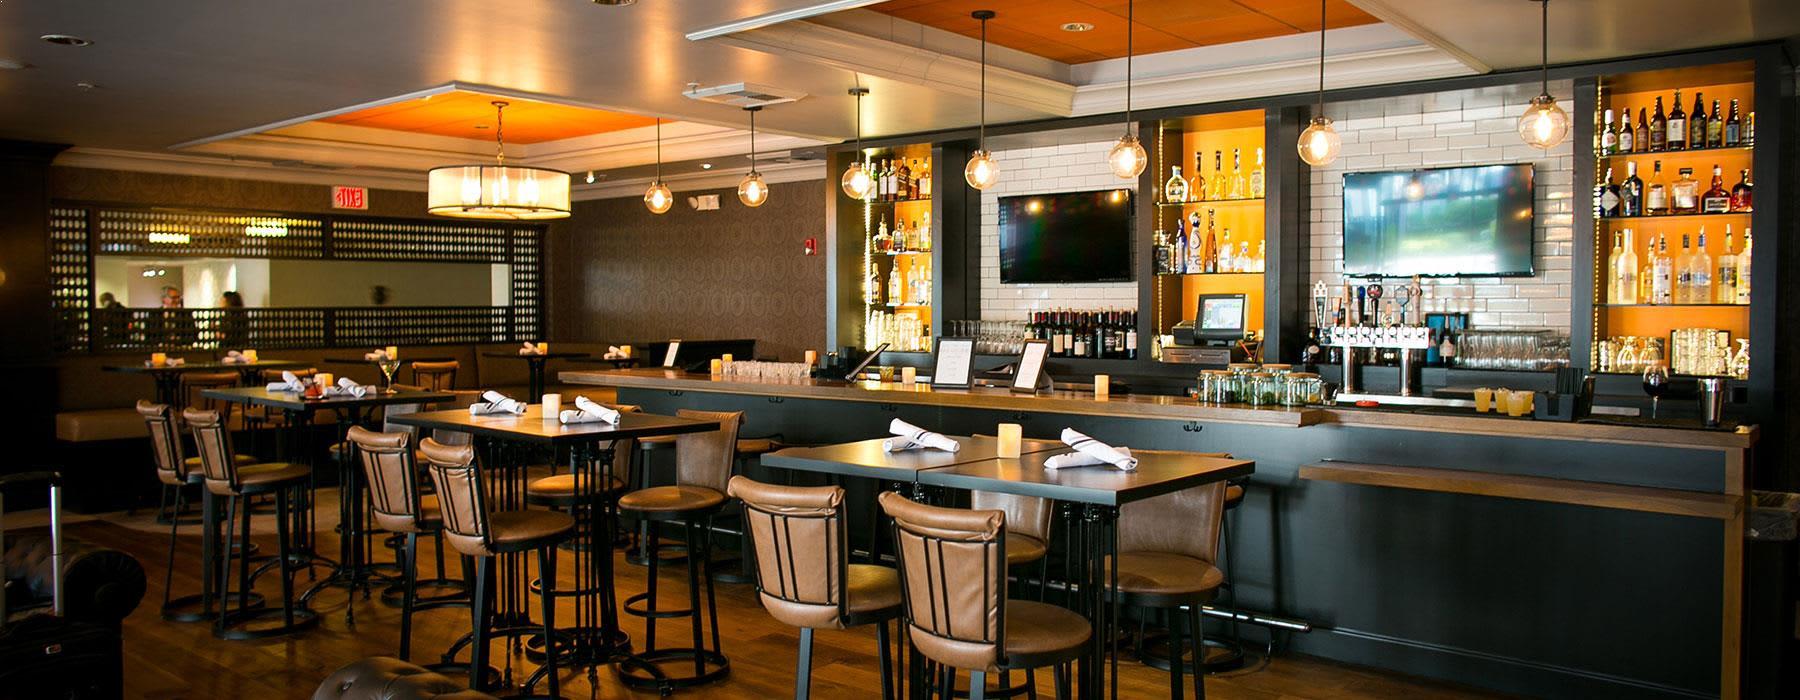 Onsite Restaurant/Bar at Crowne Plaza Costa Mesa OC